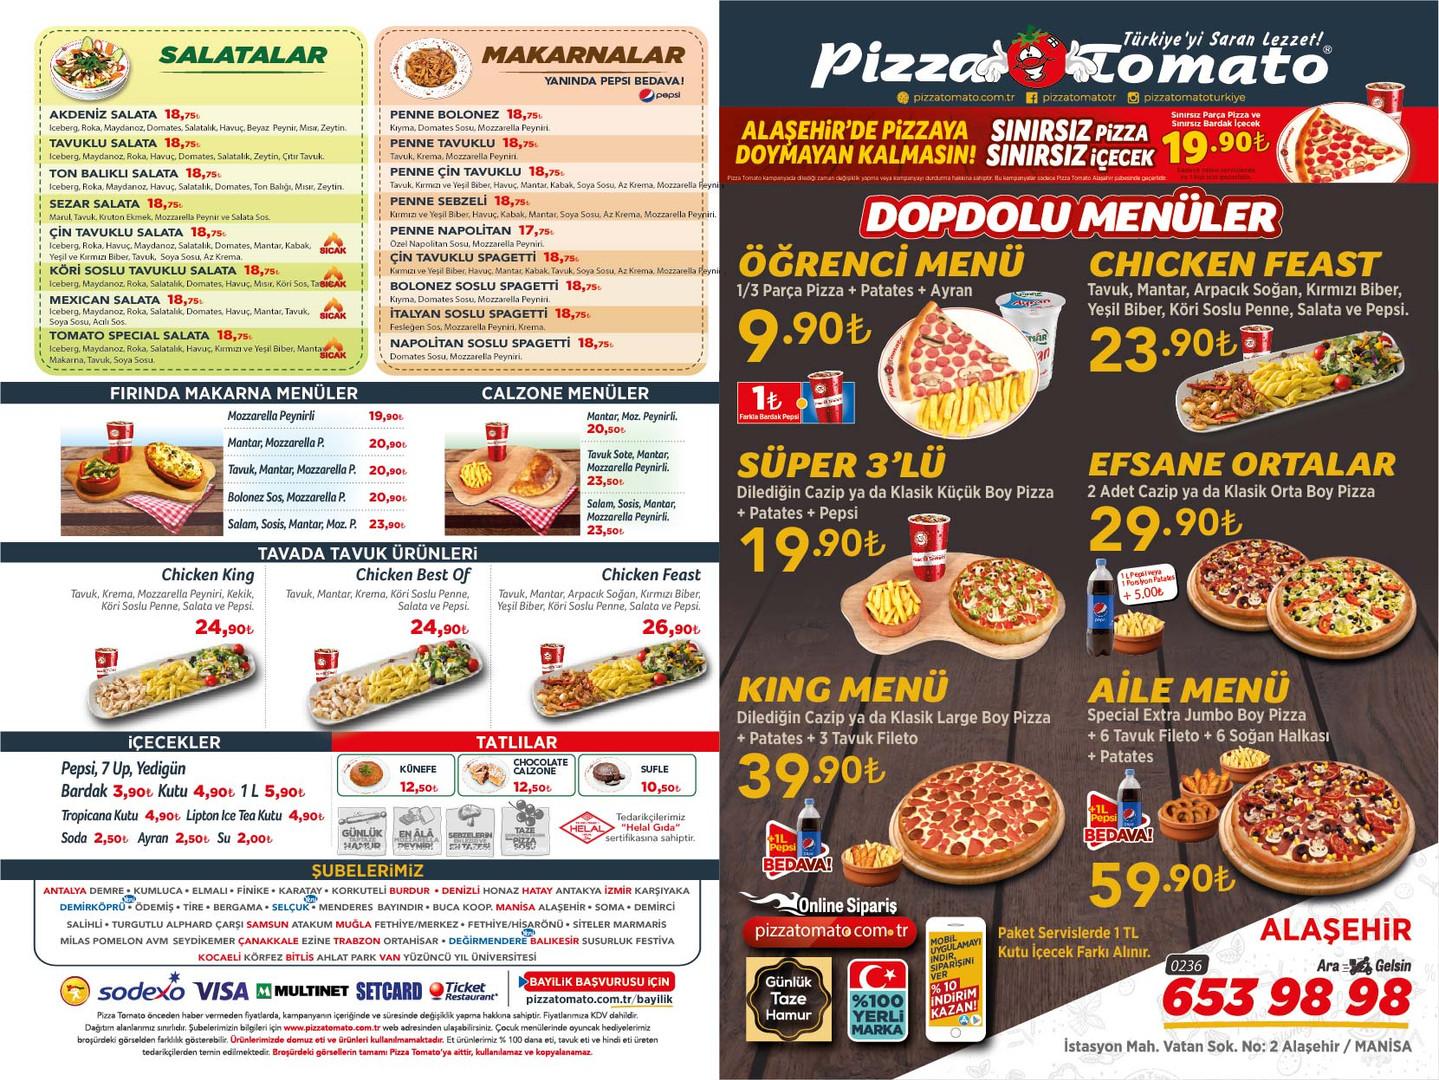 Pizza Tomato alasehir menu on sayfa.jpg